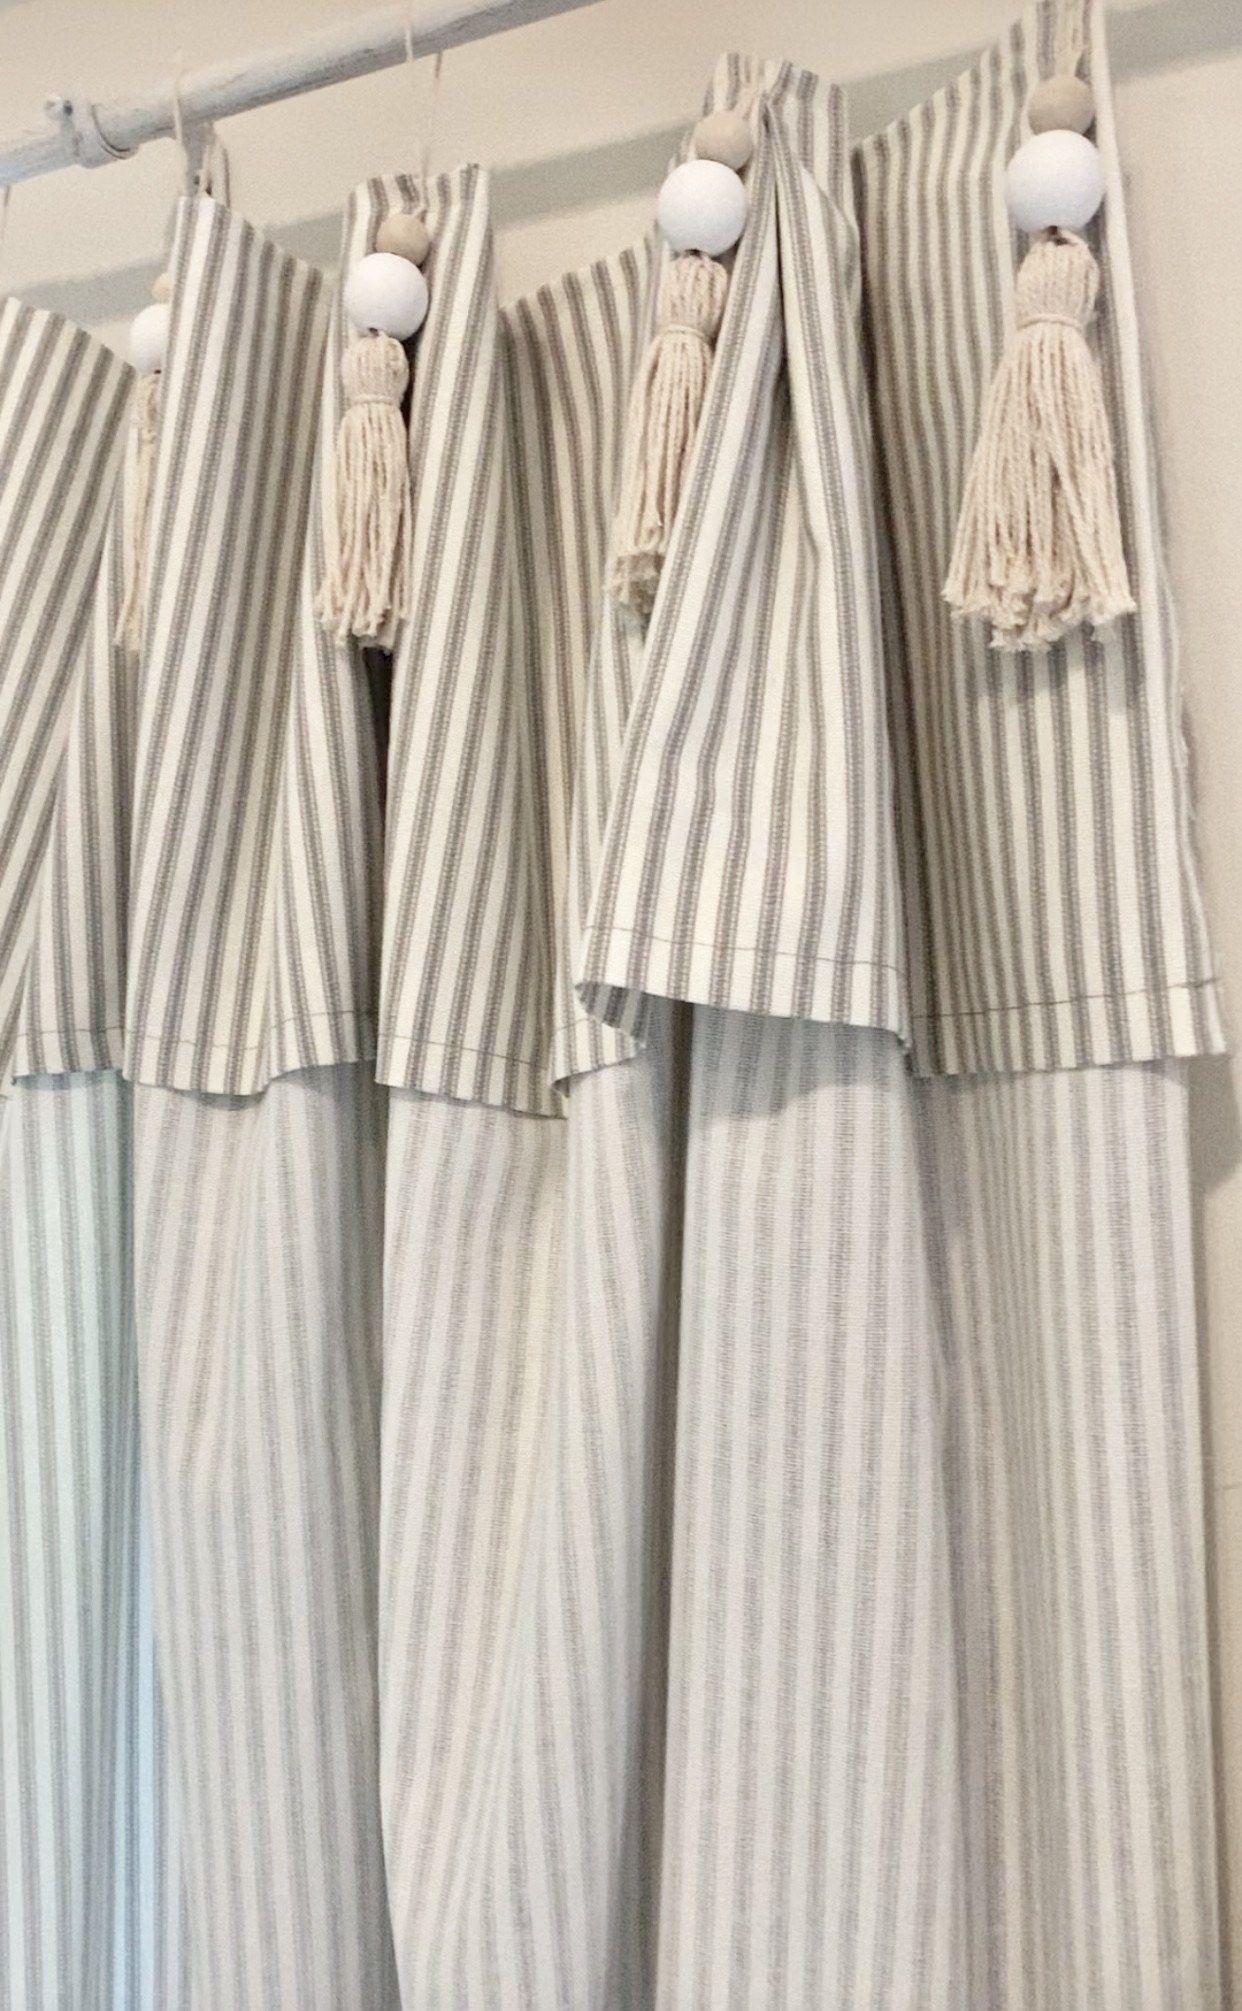 Diy Pottery Barn Inspired Tassel Ticking Stripe Curtains Ticking Stripe Curtains Pottery Barn Curtains Diy Pottery